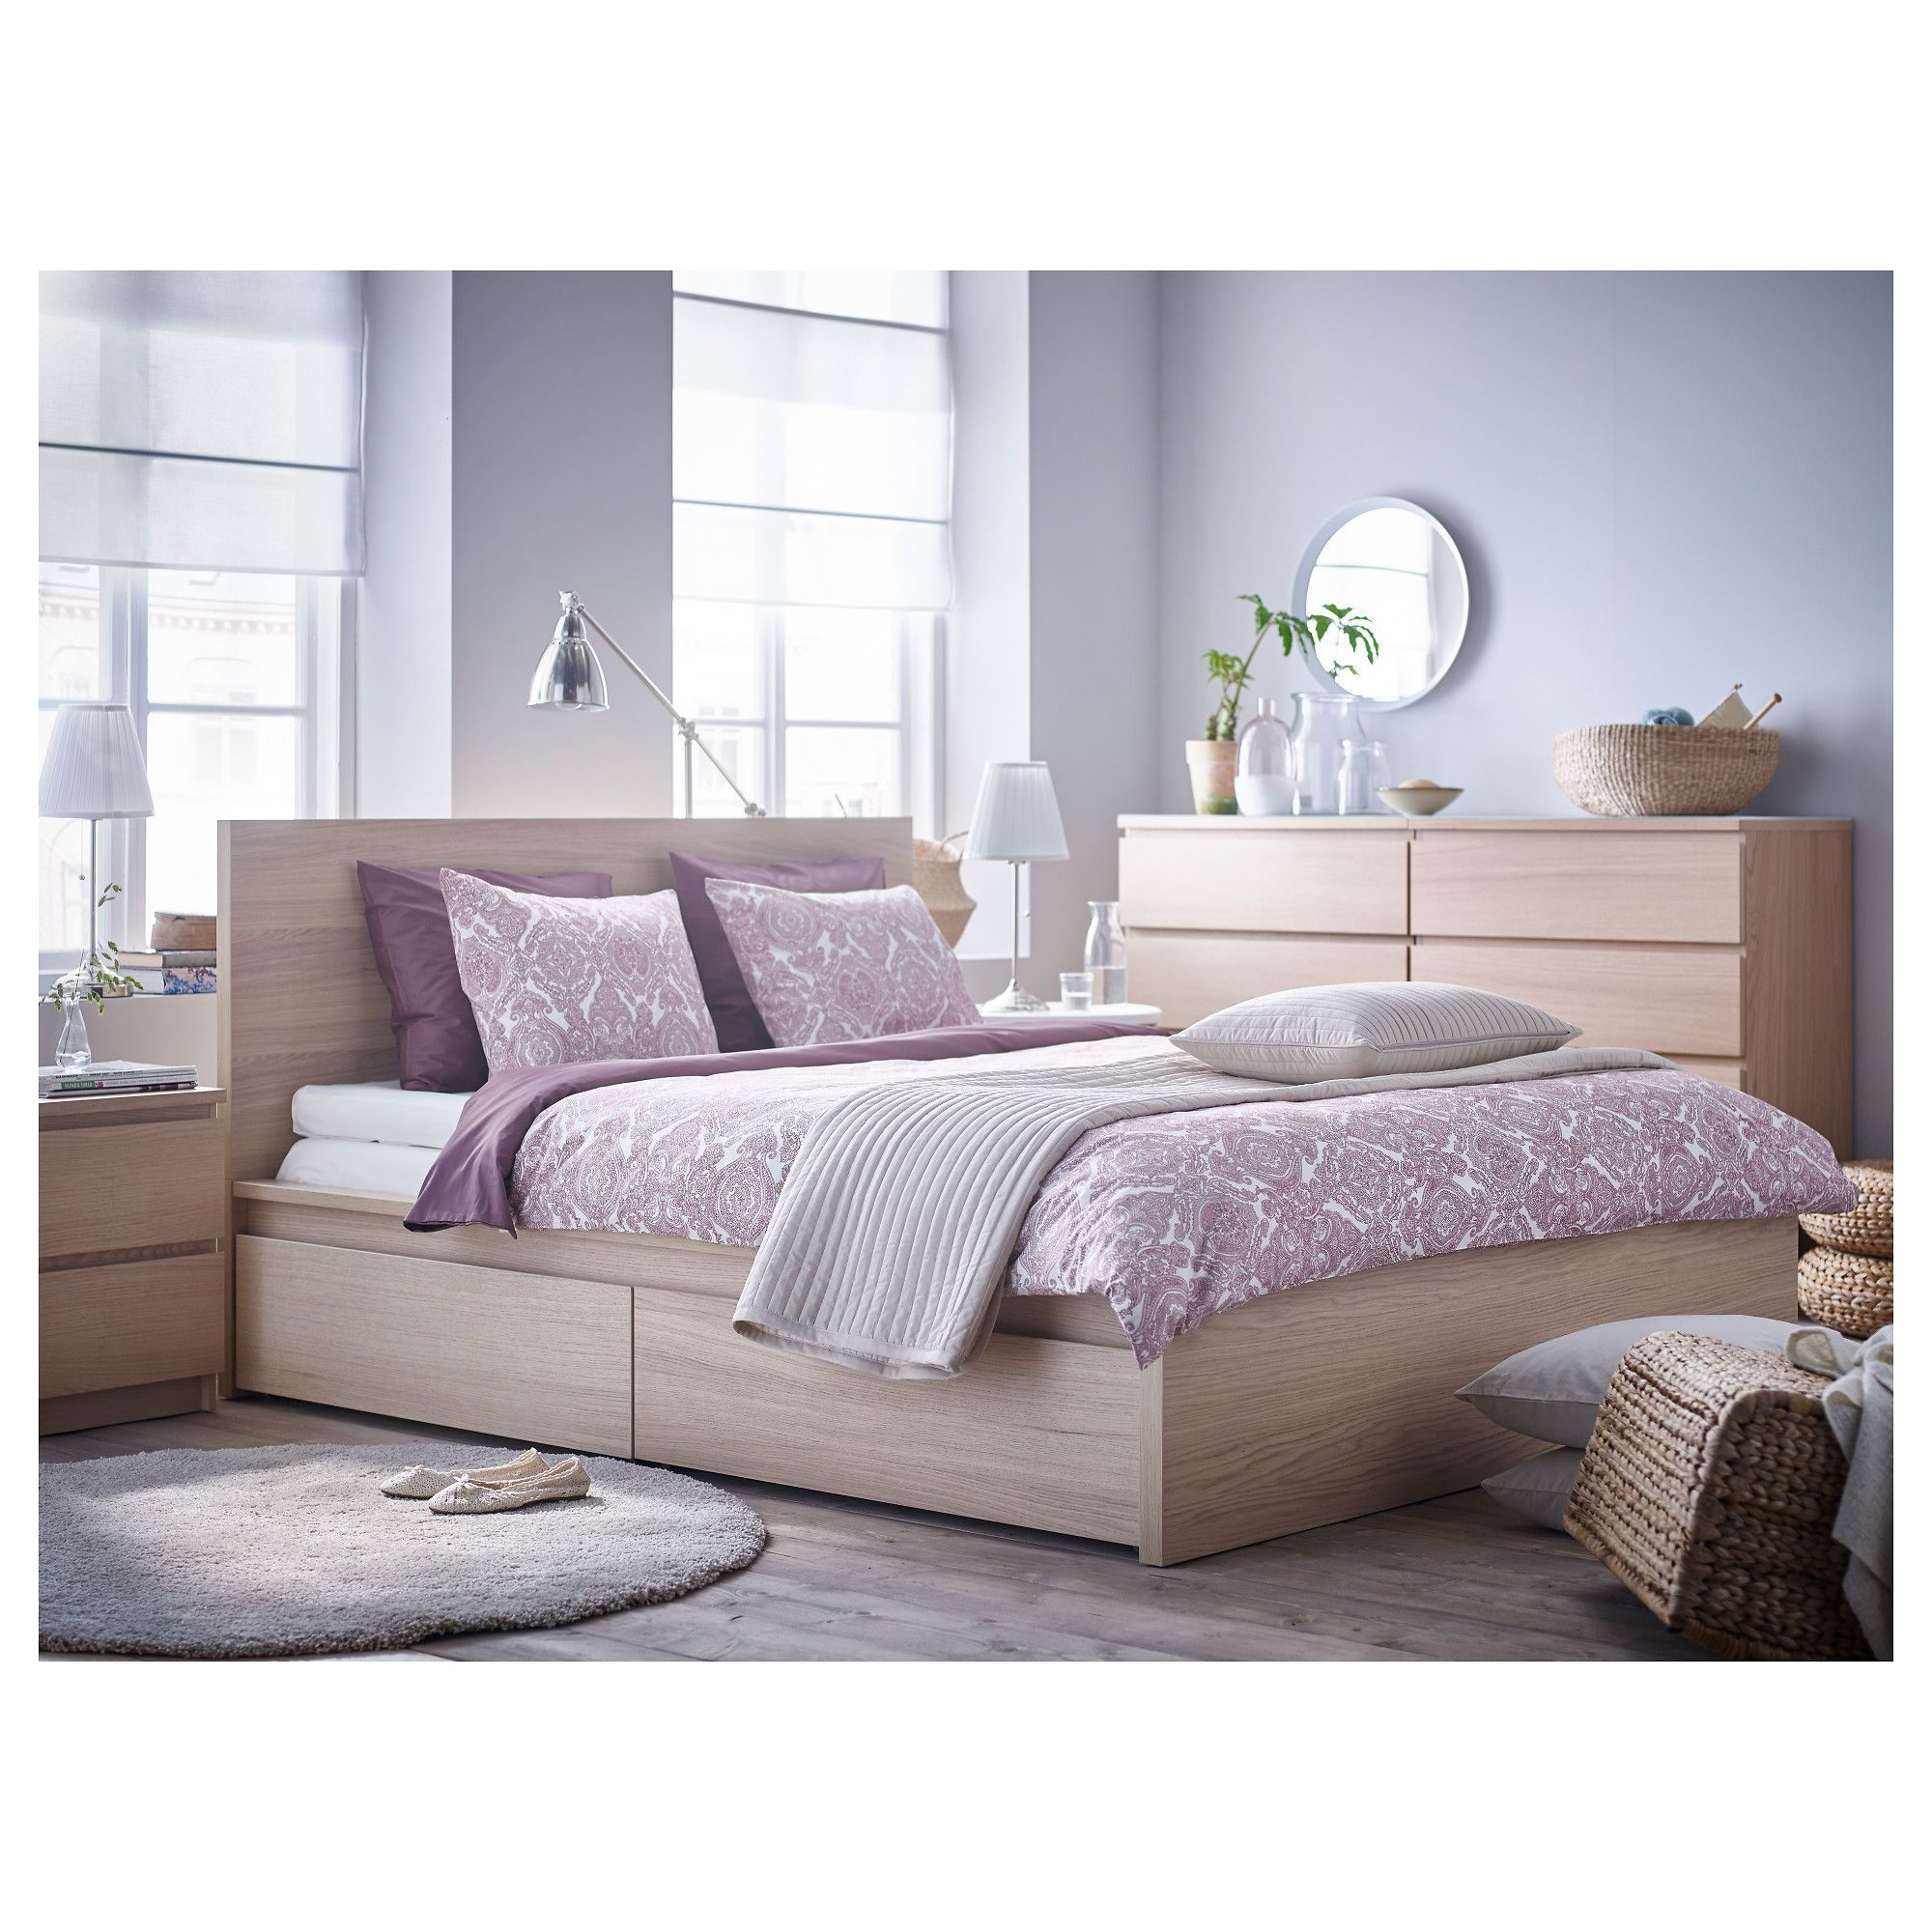 Lit Malm Ikea 90 Frais Malm High Bed Frame 2 Storage Boxes White Stained Oak Veneer Luröy